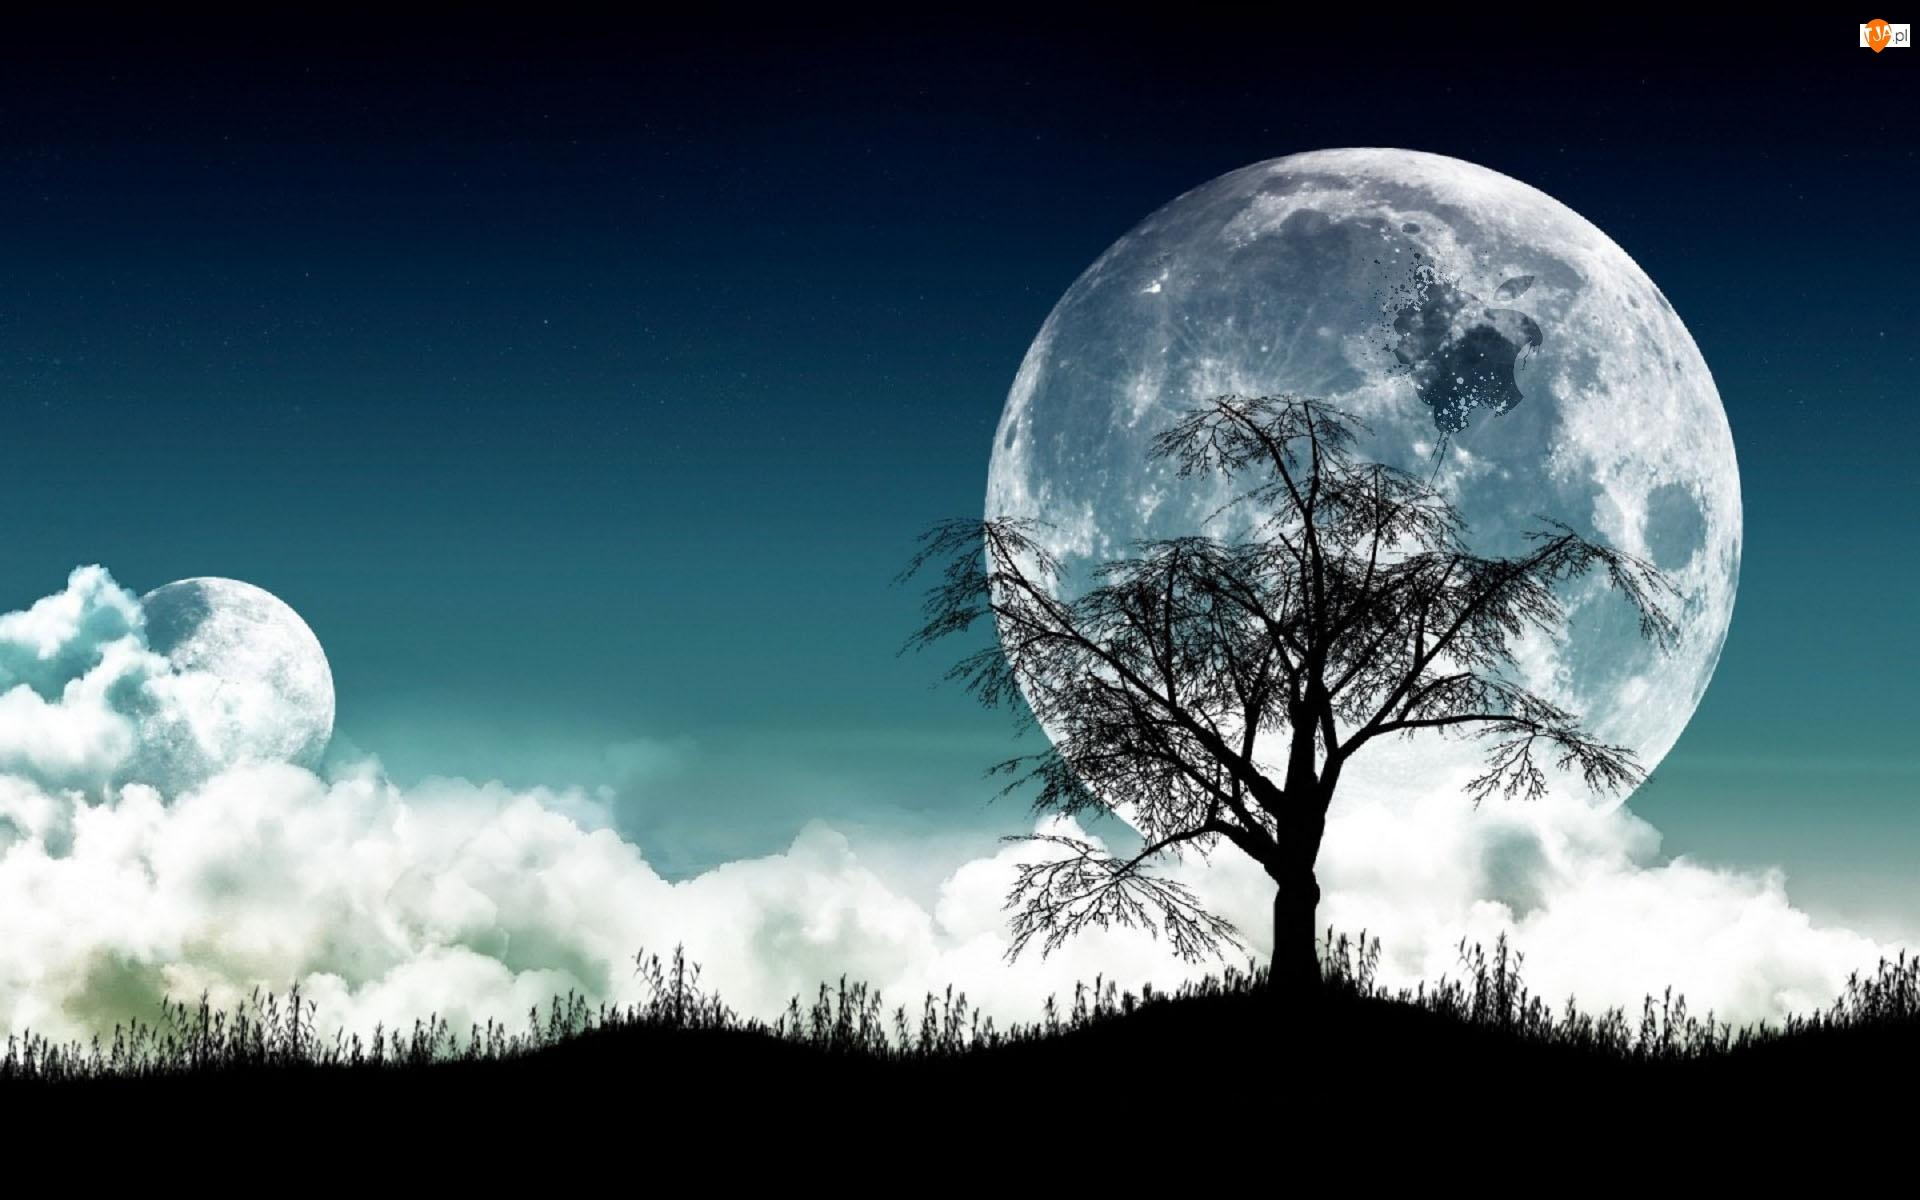 Apple, Księżyc, Noc, Drzewo, Logo